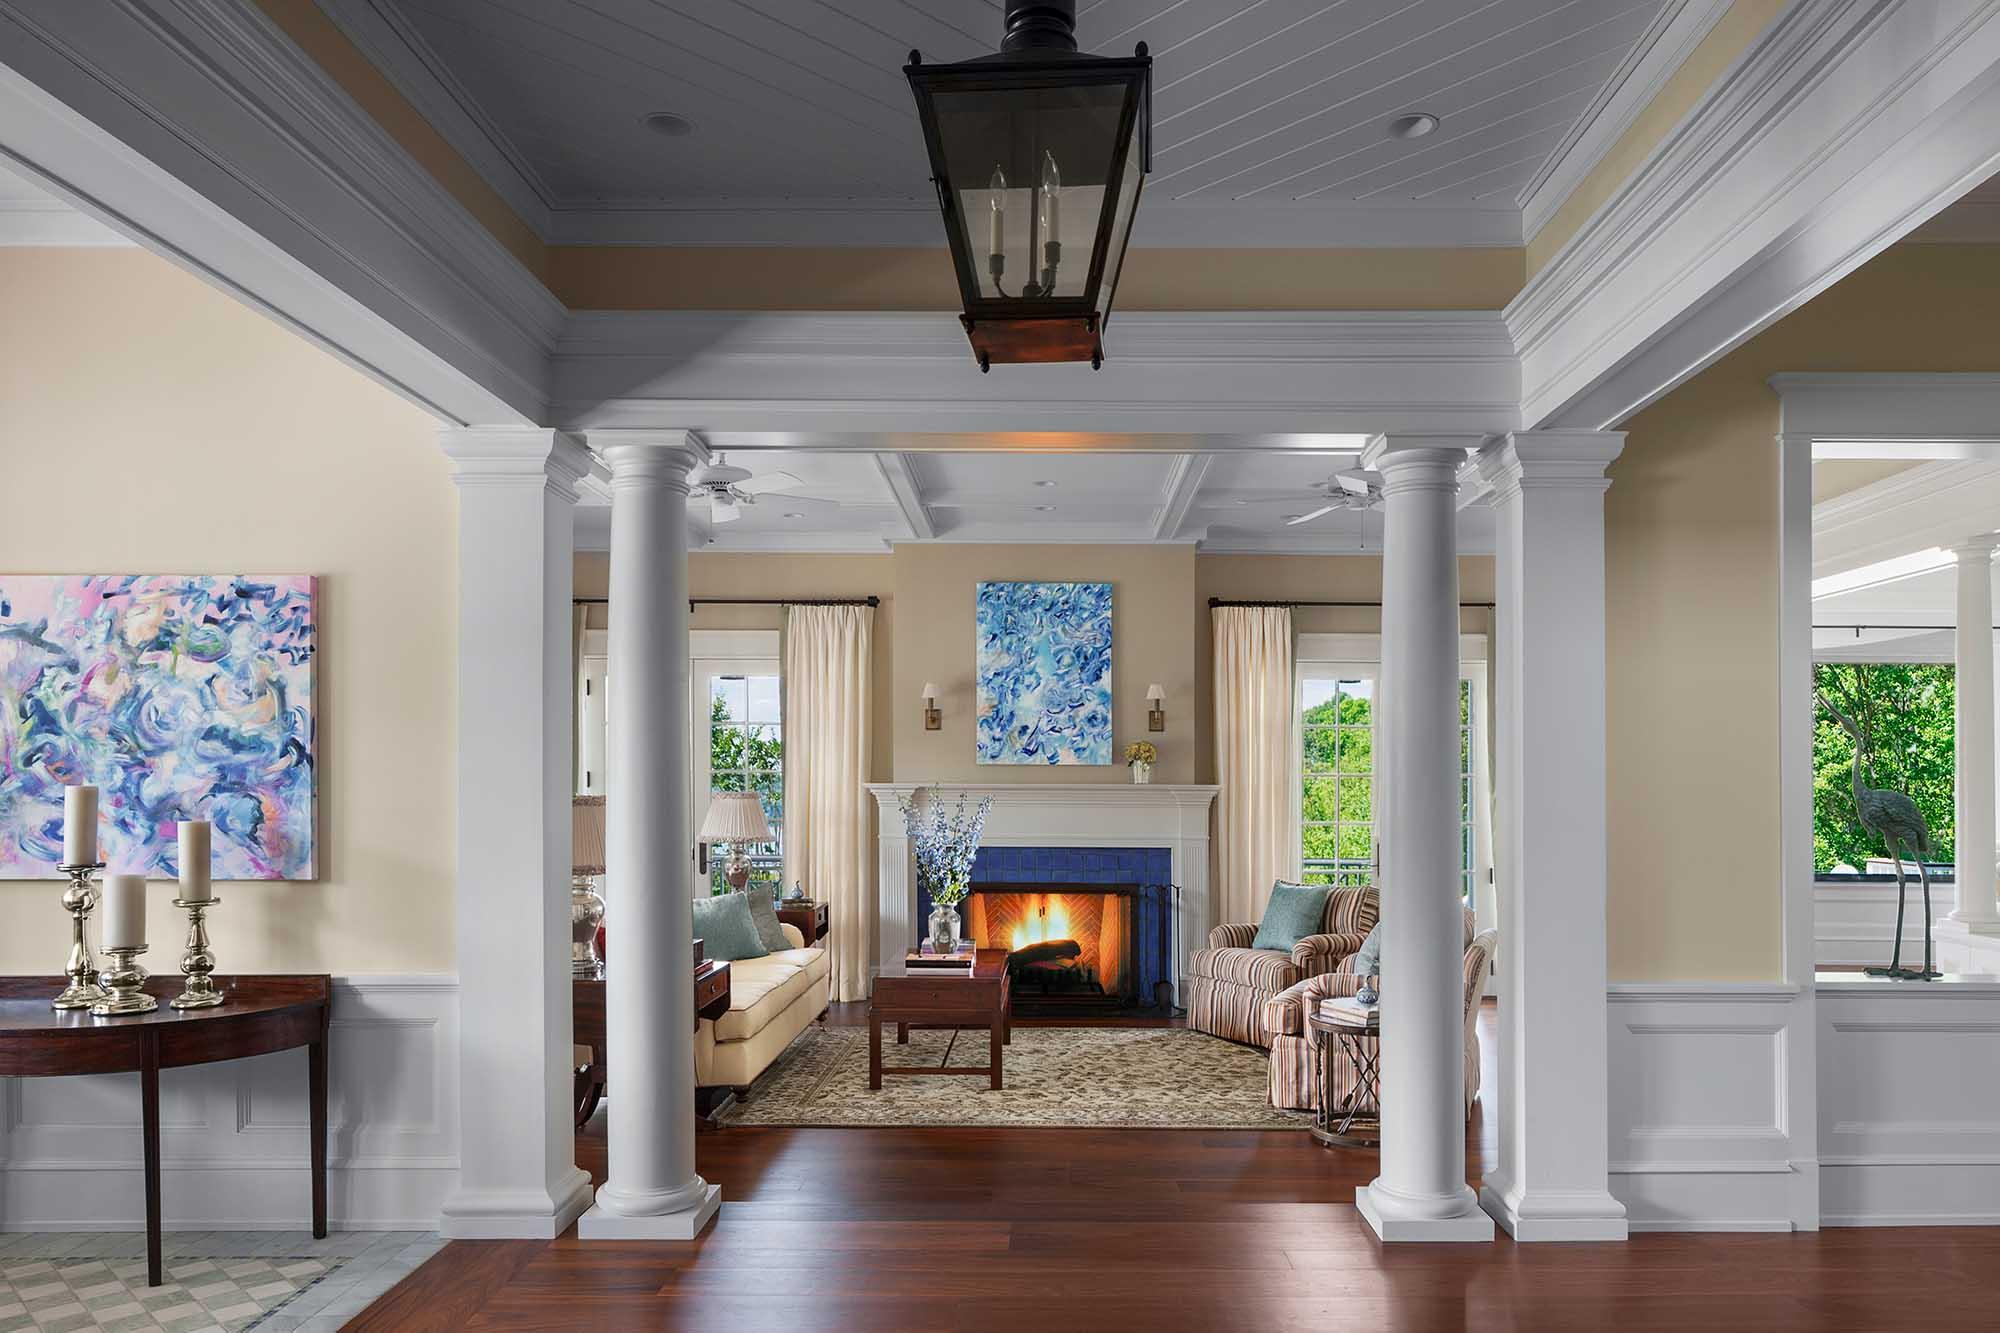 Queen Anne Revival, Cold Spring Harbor, long island, living room, entry hall, modern art, doric columns, wainscott, coffer ceiling